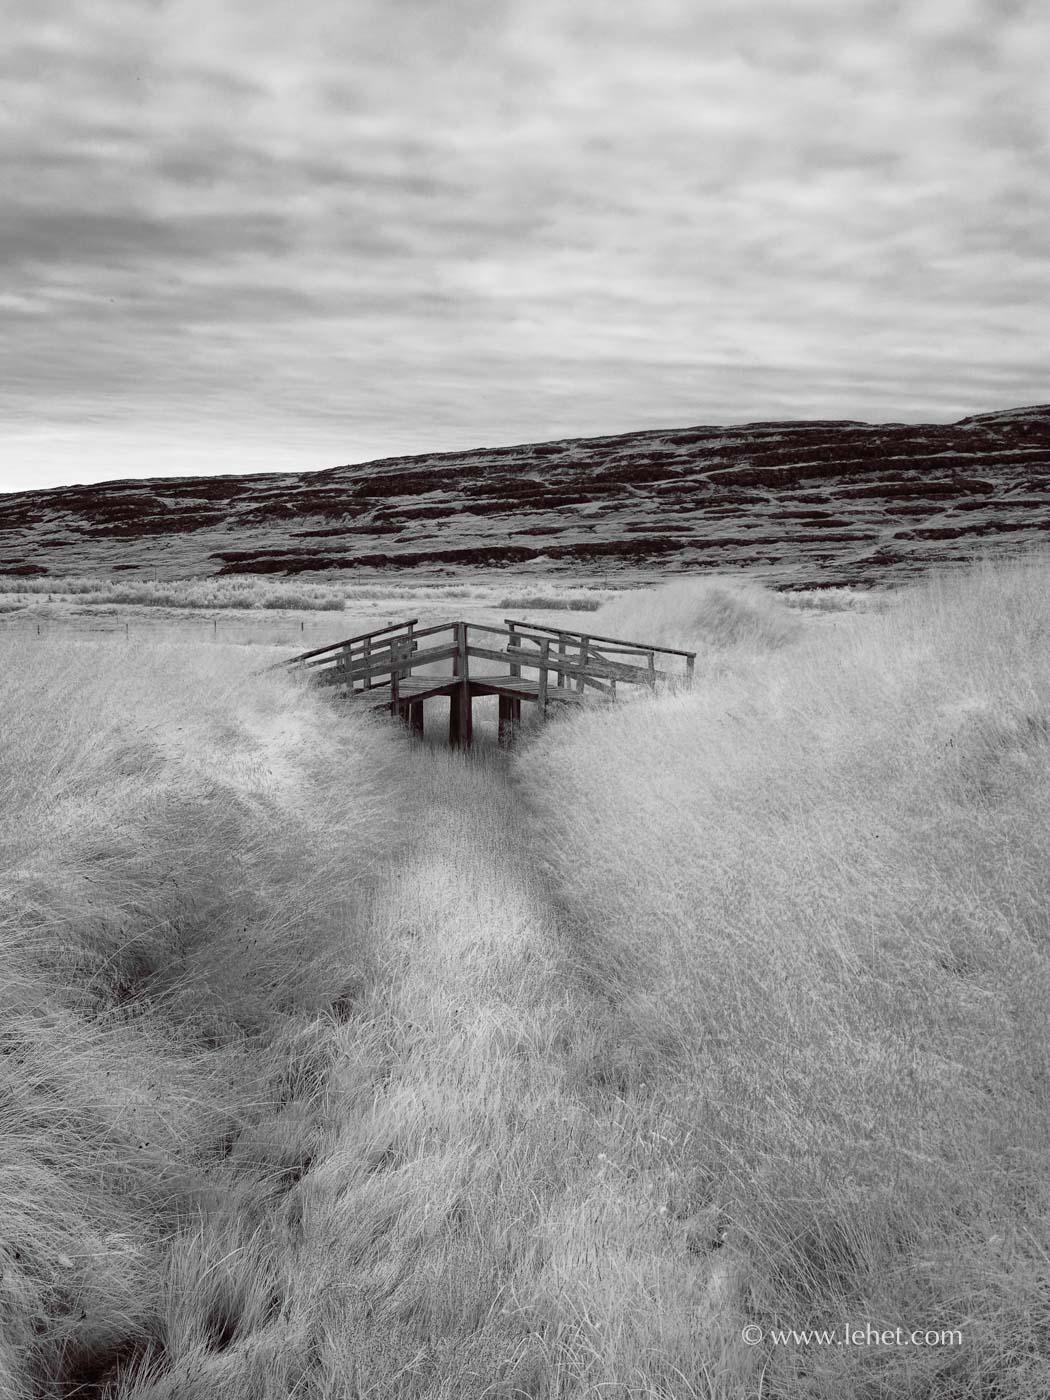 Four Way Foot Bridge, Iceland